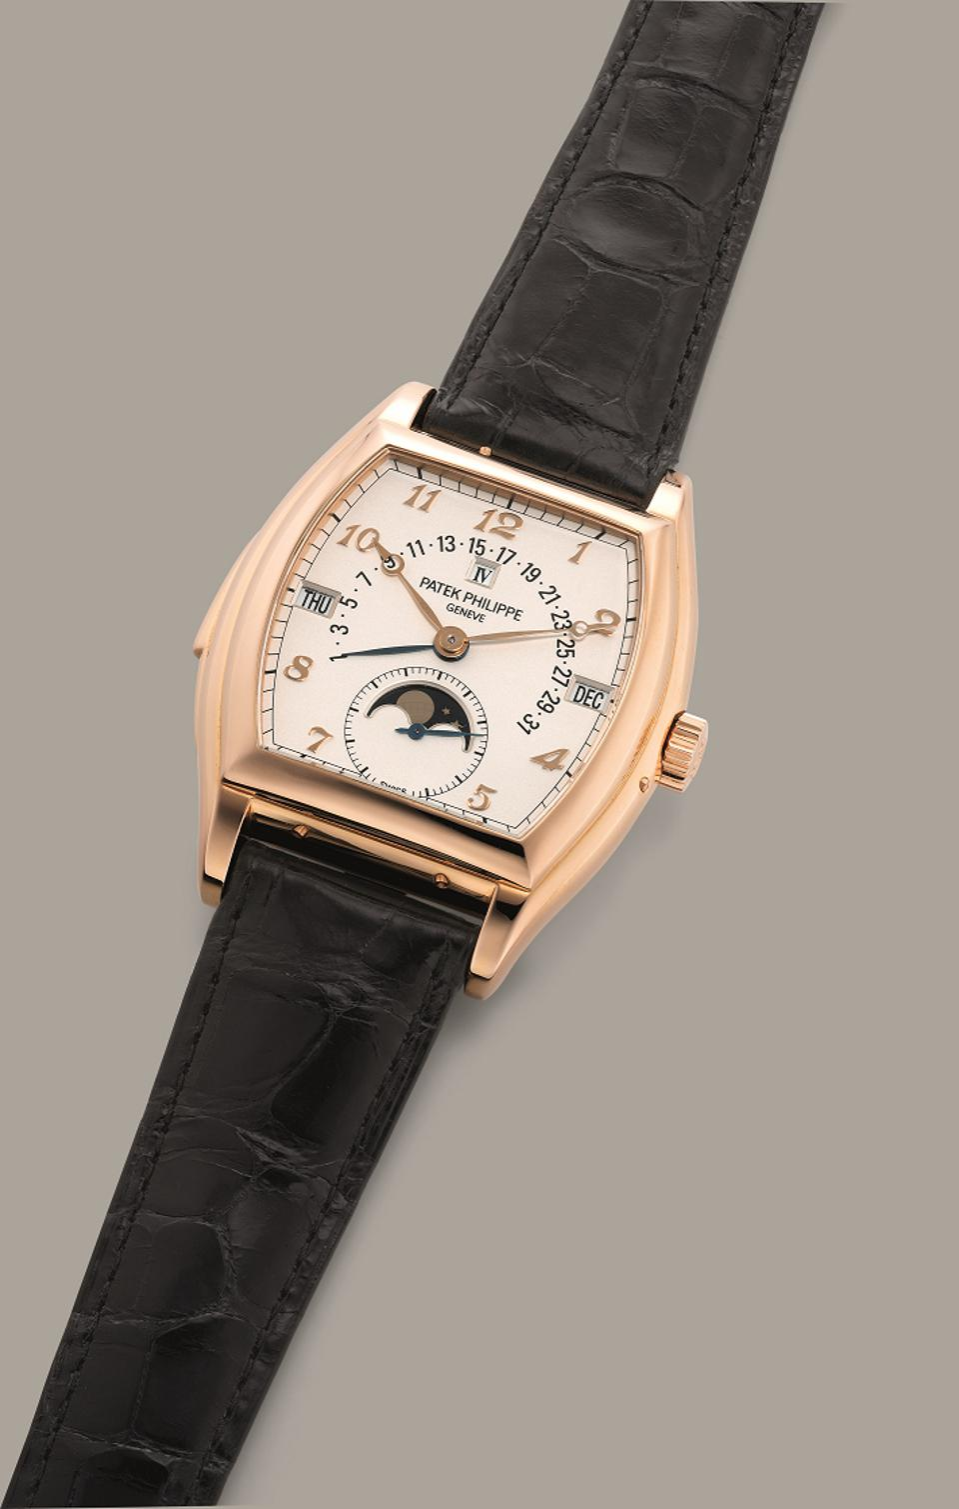 Patek Philippe Reference 5013R, 2000, pink gold tonneau minute repeater perpetual calendar